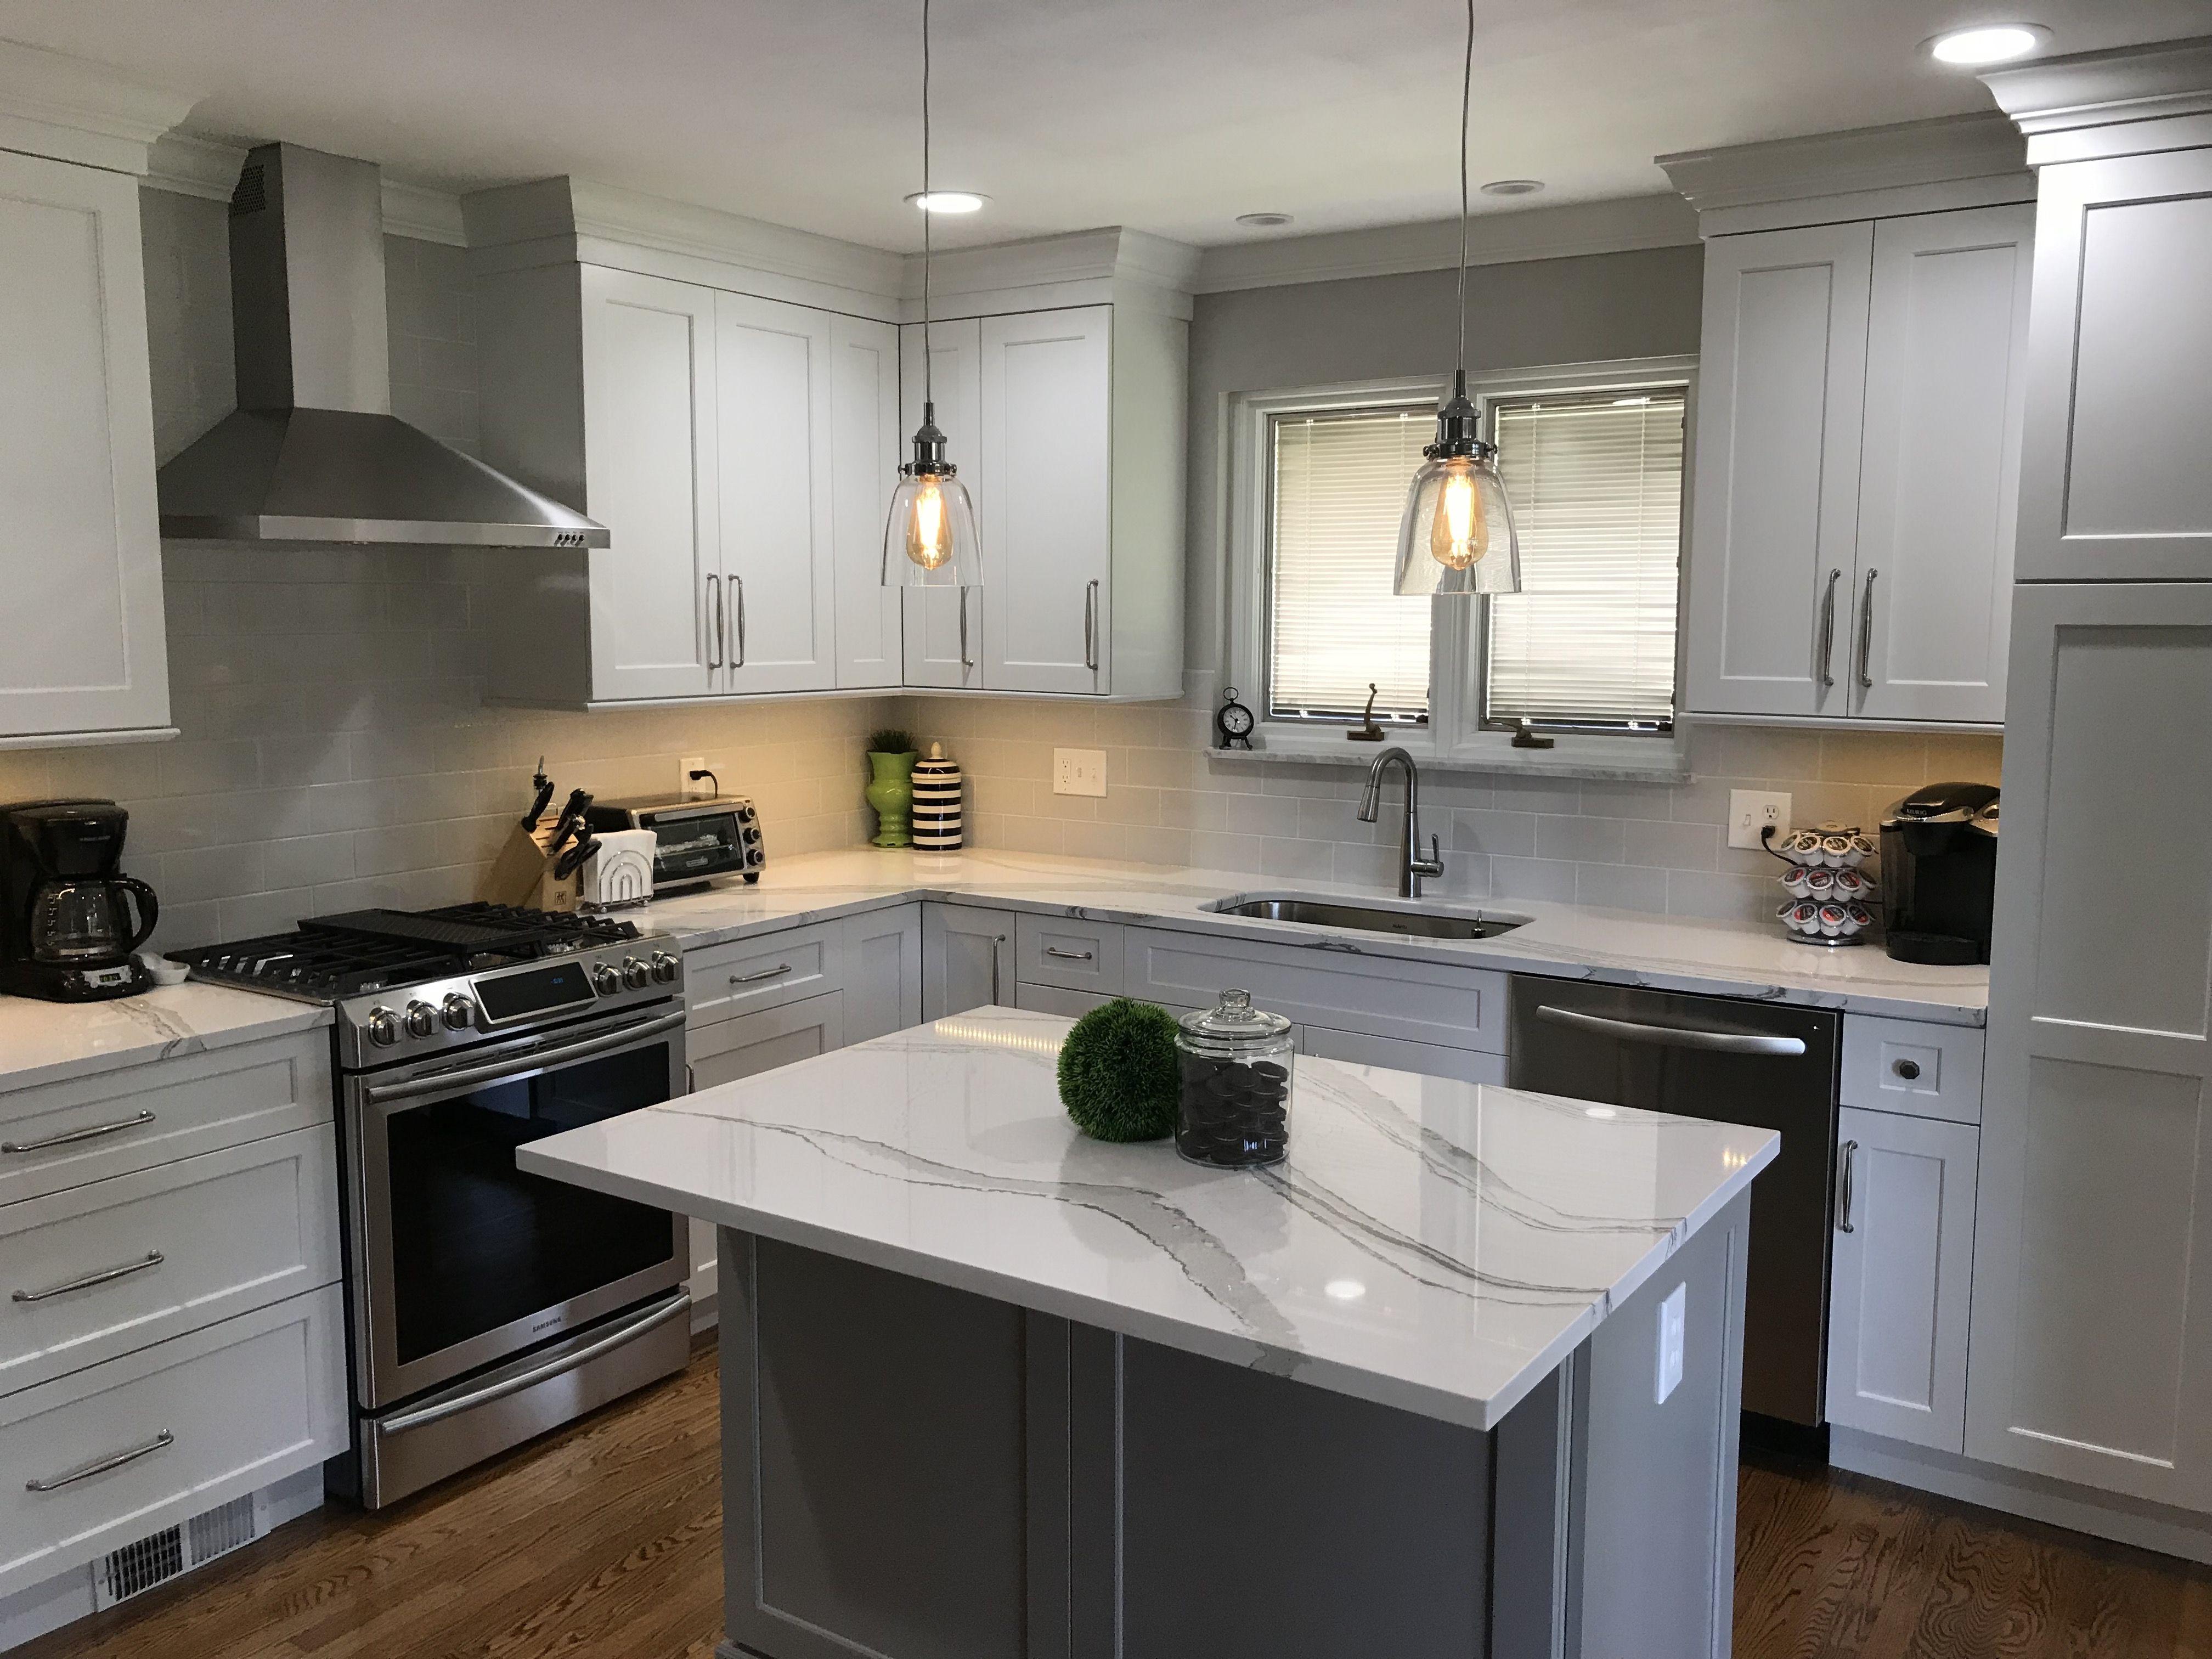 Kitchen Remodel White Cabinets Light Gray Backsplash With Light